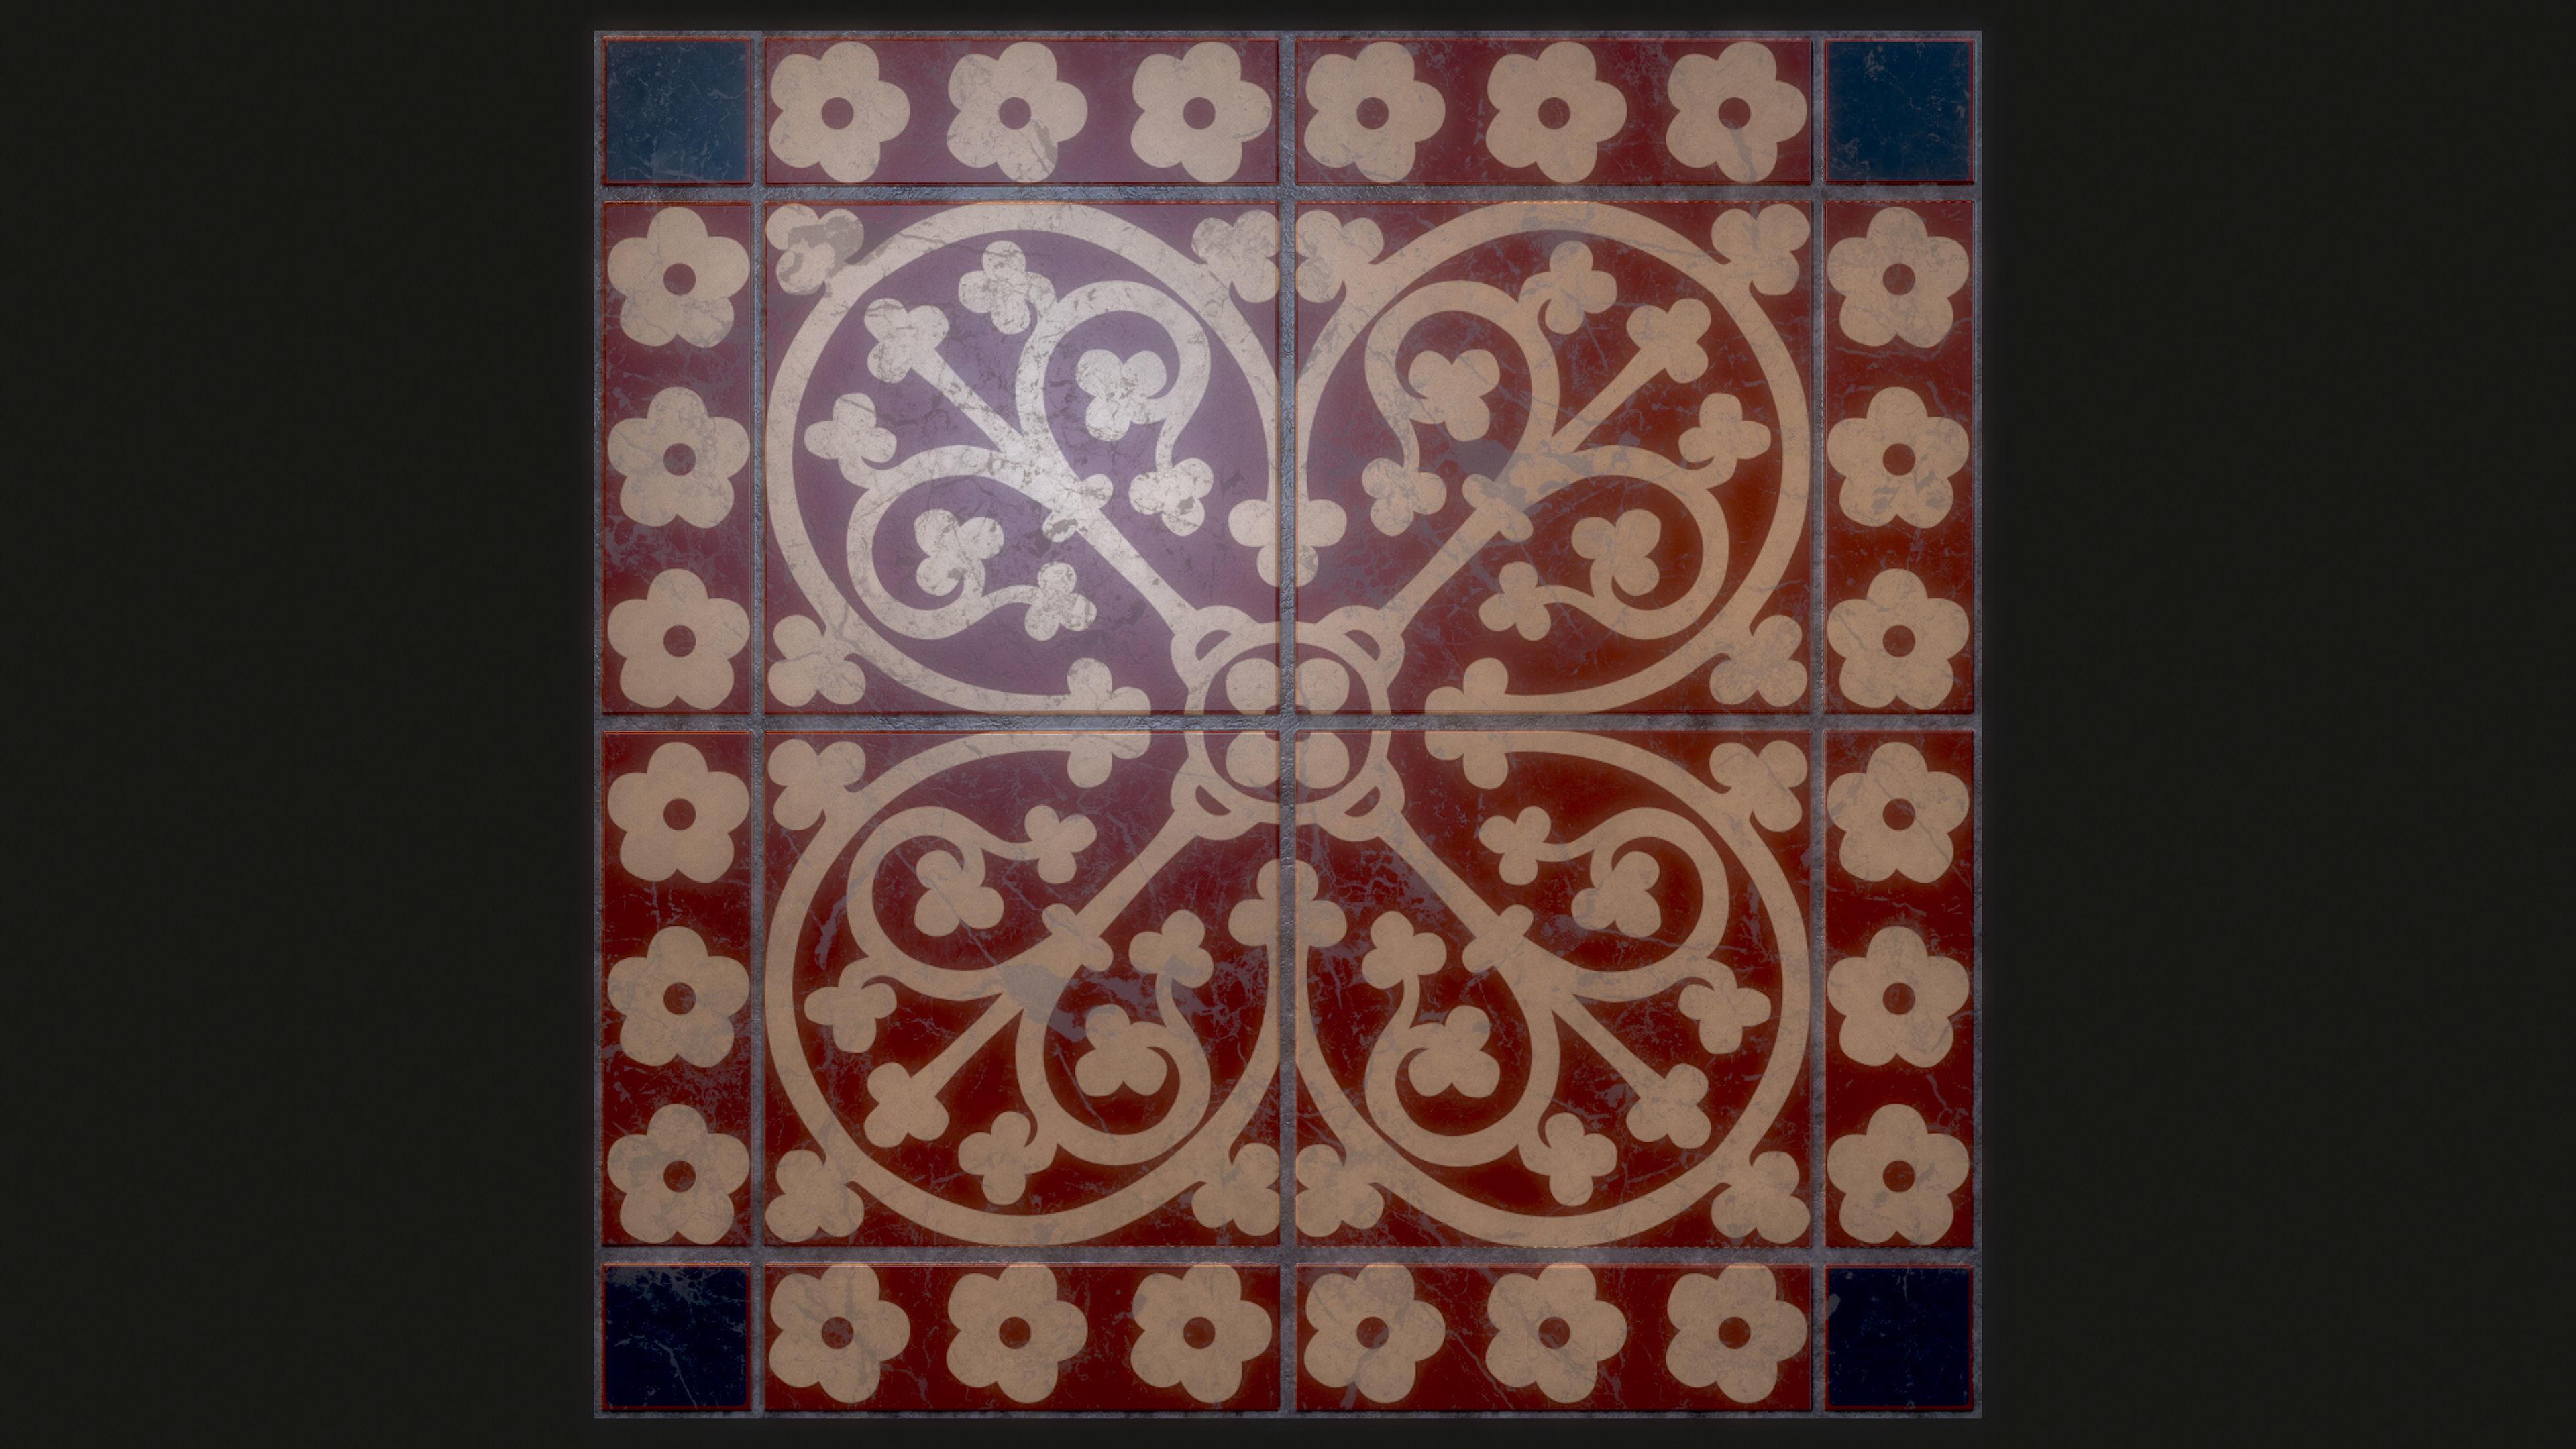 decorative medieval ceramic floor tile an authentic replica texture